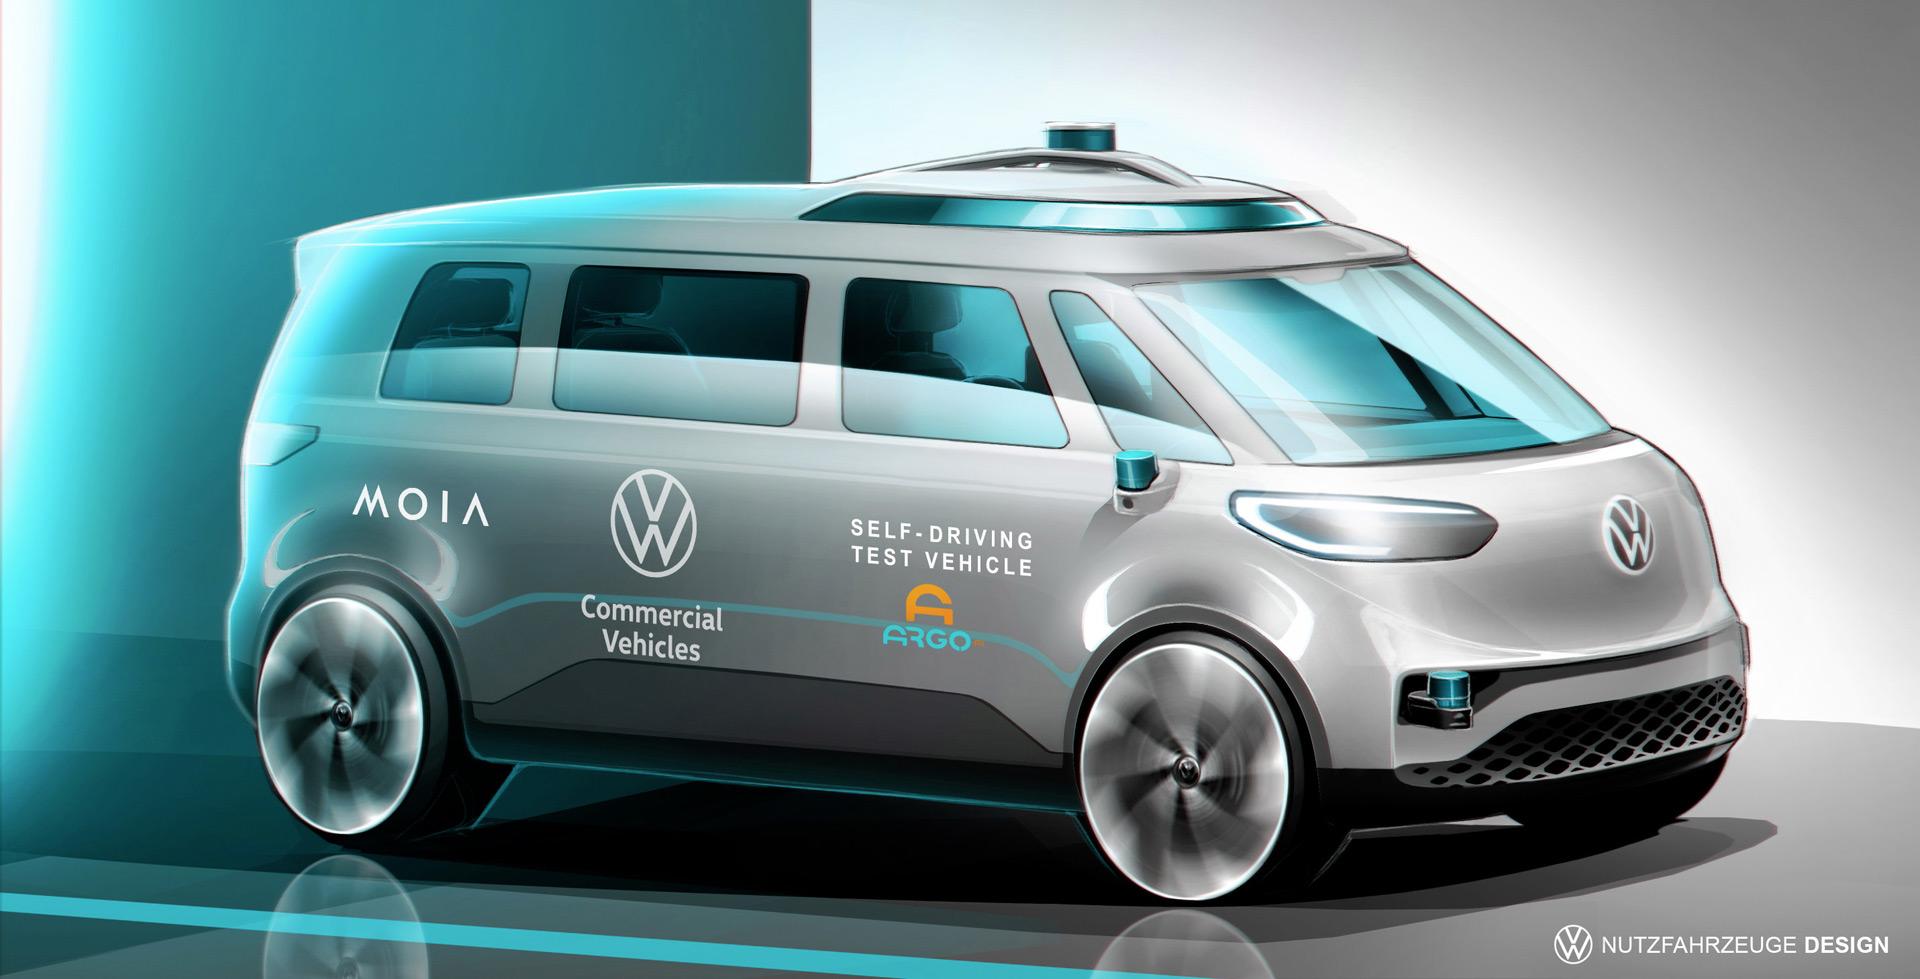 volkswagen-id-buzz-ad-self-driving-car-prototype_100791595_h